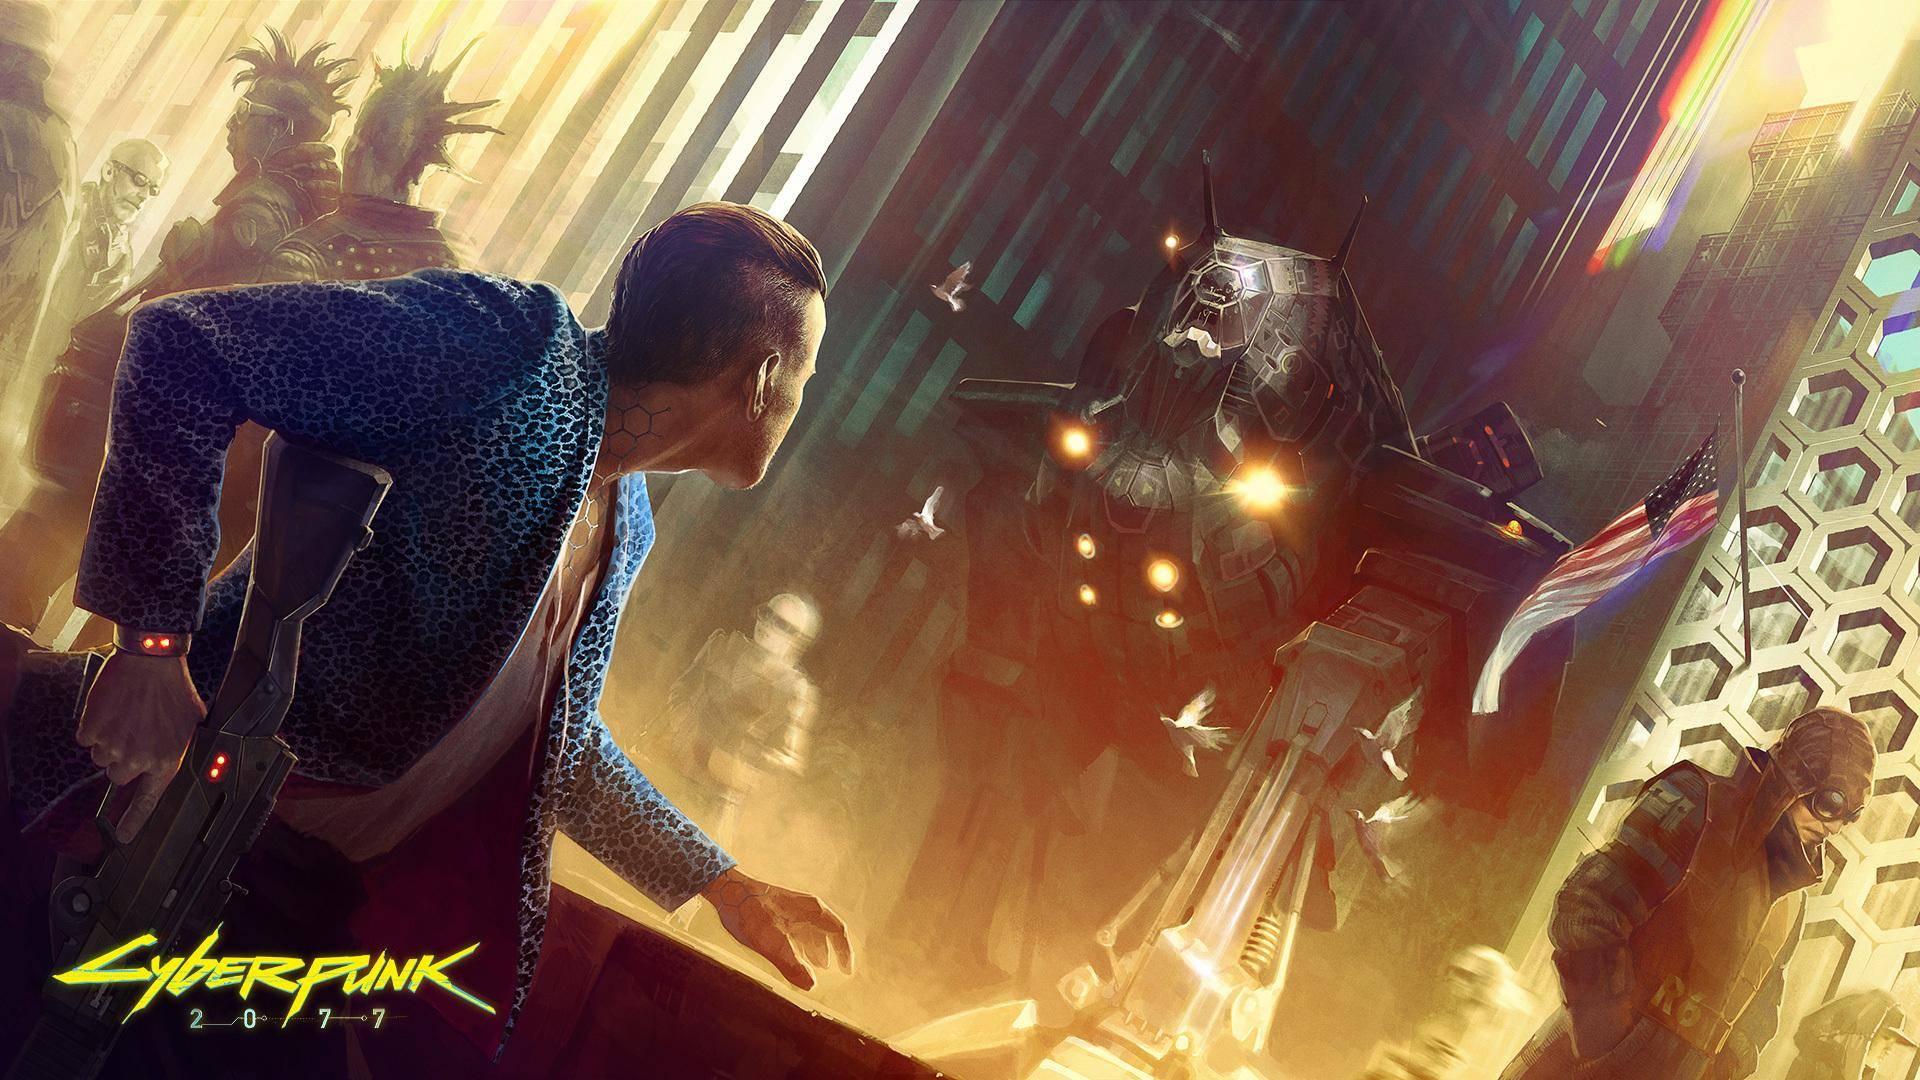 CyberPunk 2077 میتواند به موفقیت بزرگتری نسبت به بازی The Witcher 3 دست پیدا کند